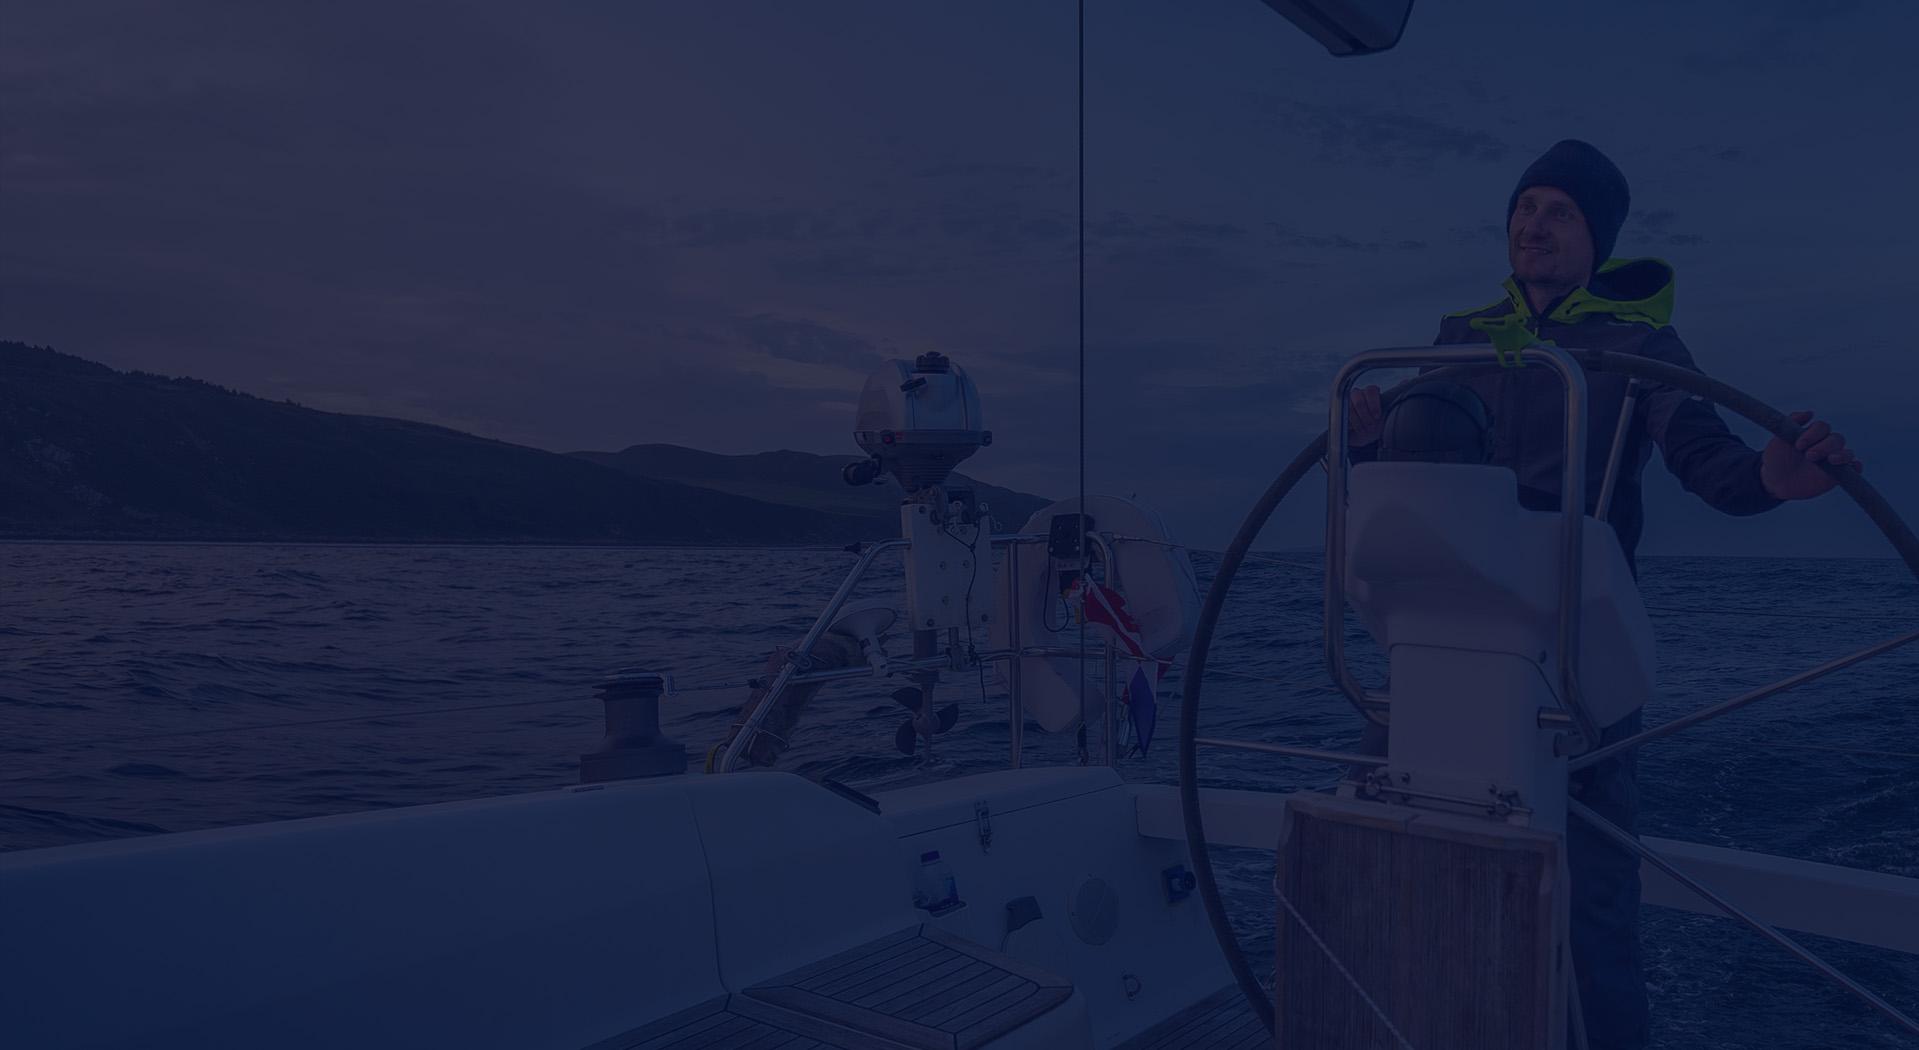 La securite a bord du bateau